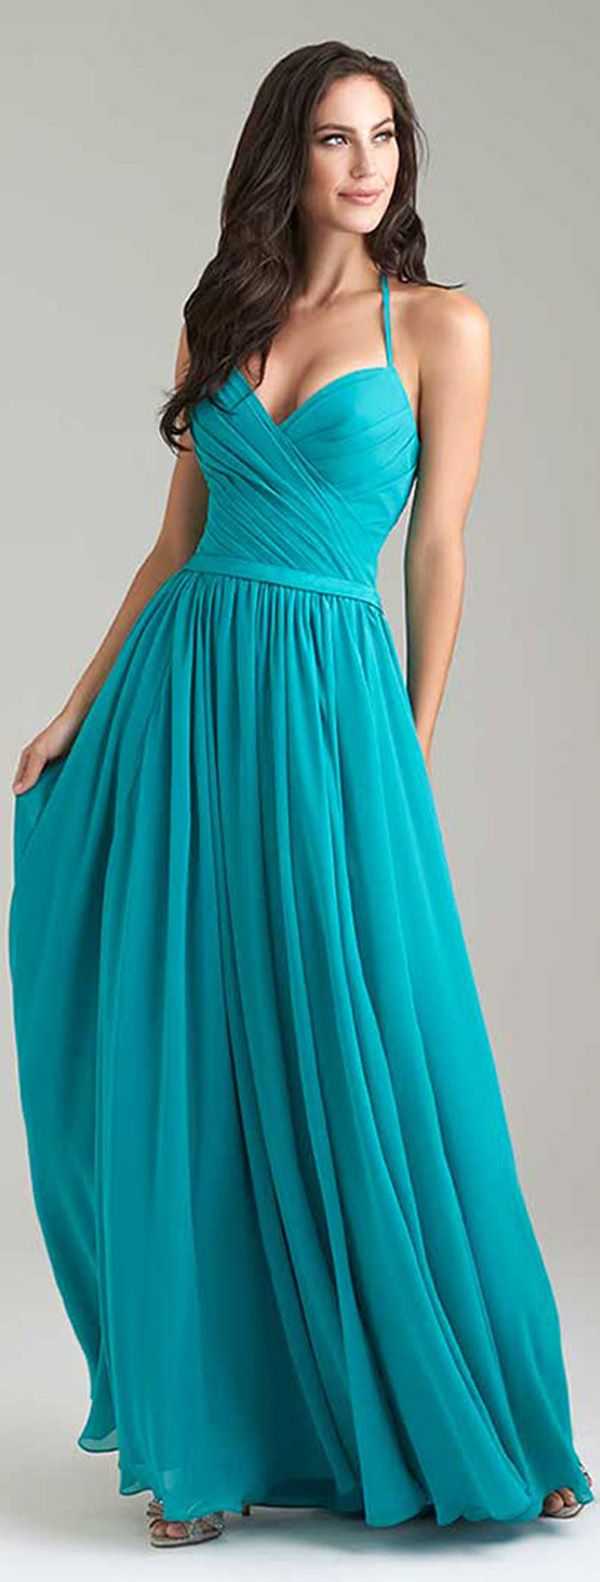 1215 best bridesmaid dresses images on pinterest bridesmaids stunning chiffon halter neckline a line bridesmaid dresses with belt ombrellifo Choice Image